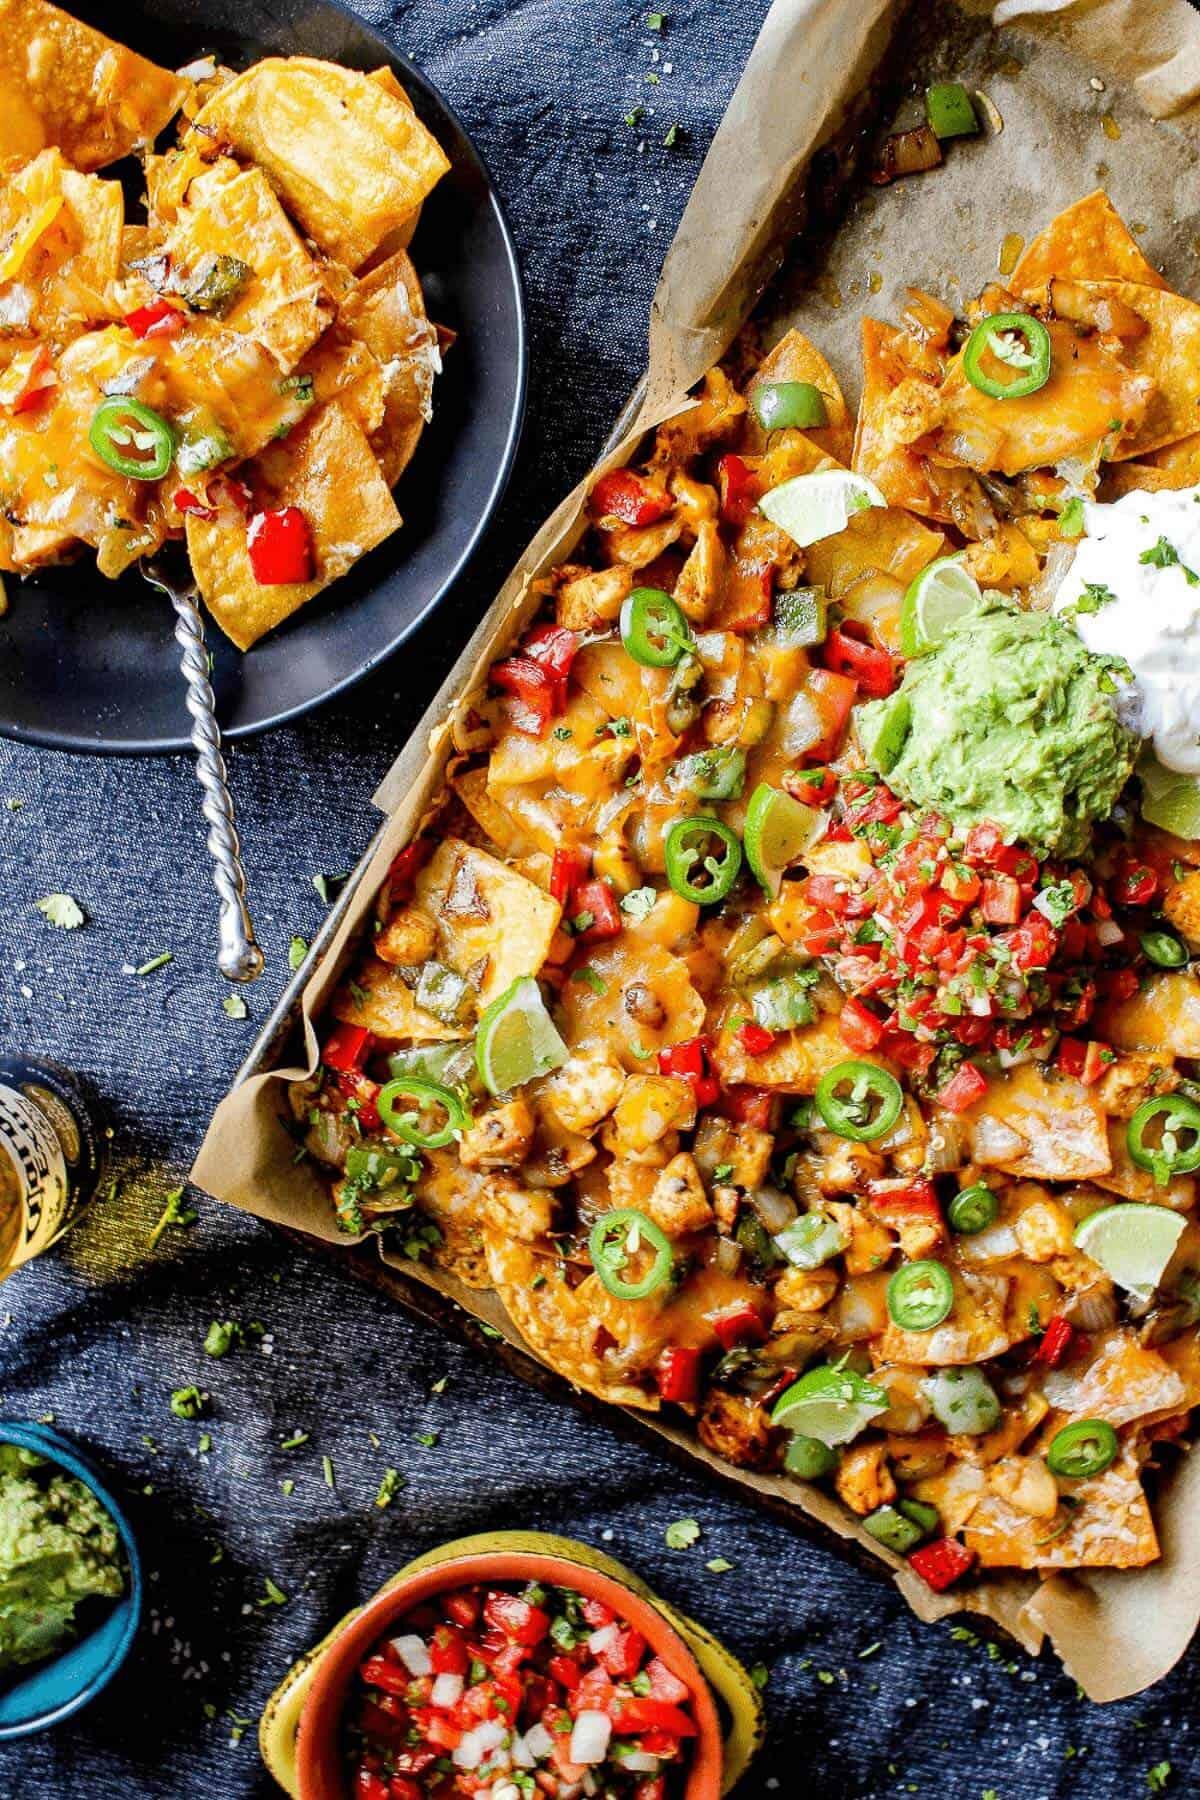 sheet pan full of chicken fajita nachos alongside garnishes of salsa, guacamole, and a plate full fo nachos